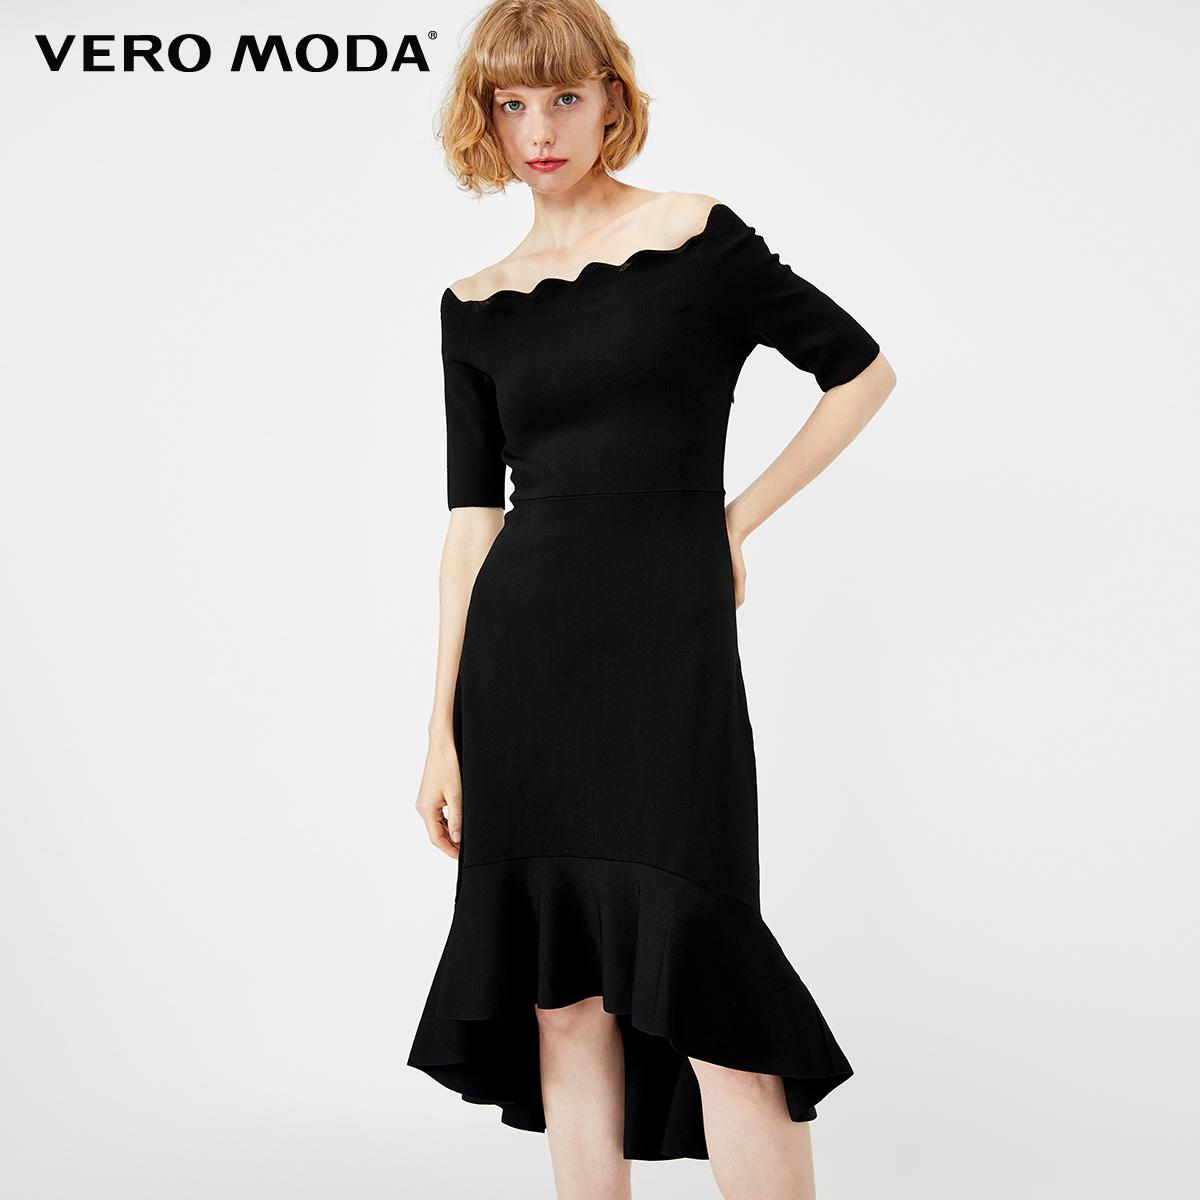 VeroModa2019荷叶新款短袖边露肩秋冬高腰针织连衣裙|319446510